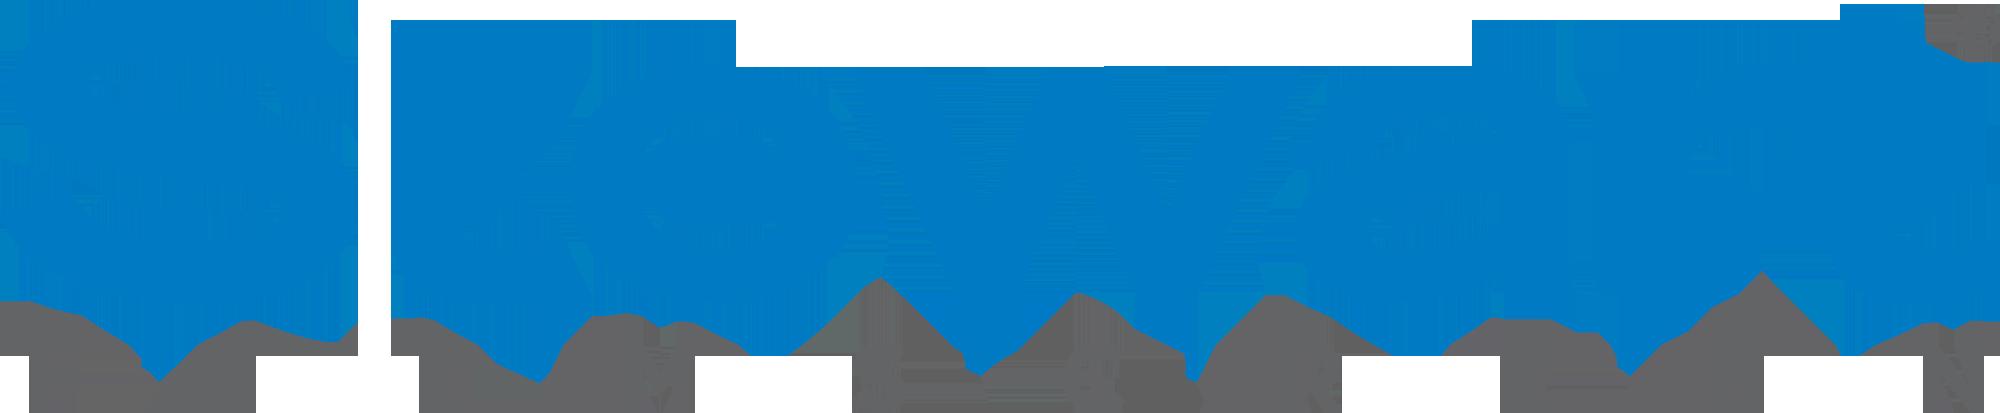 https://evolutionav.com/wp-content/uploads/2018/04/Graystewart_logo-2015edited-1.png